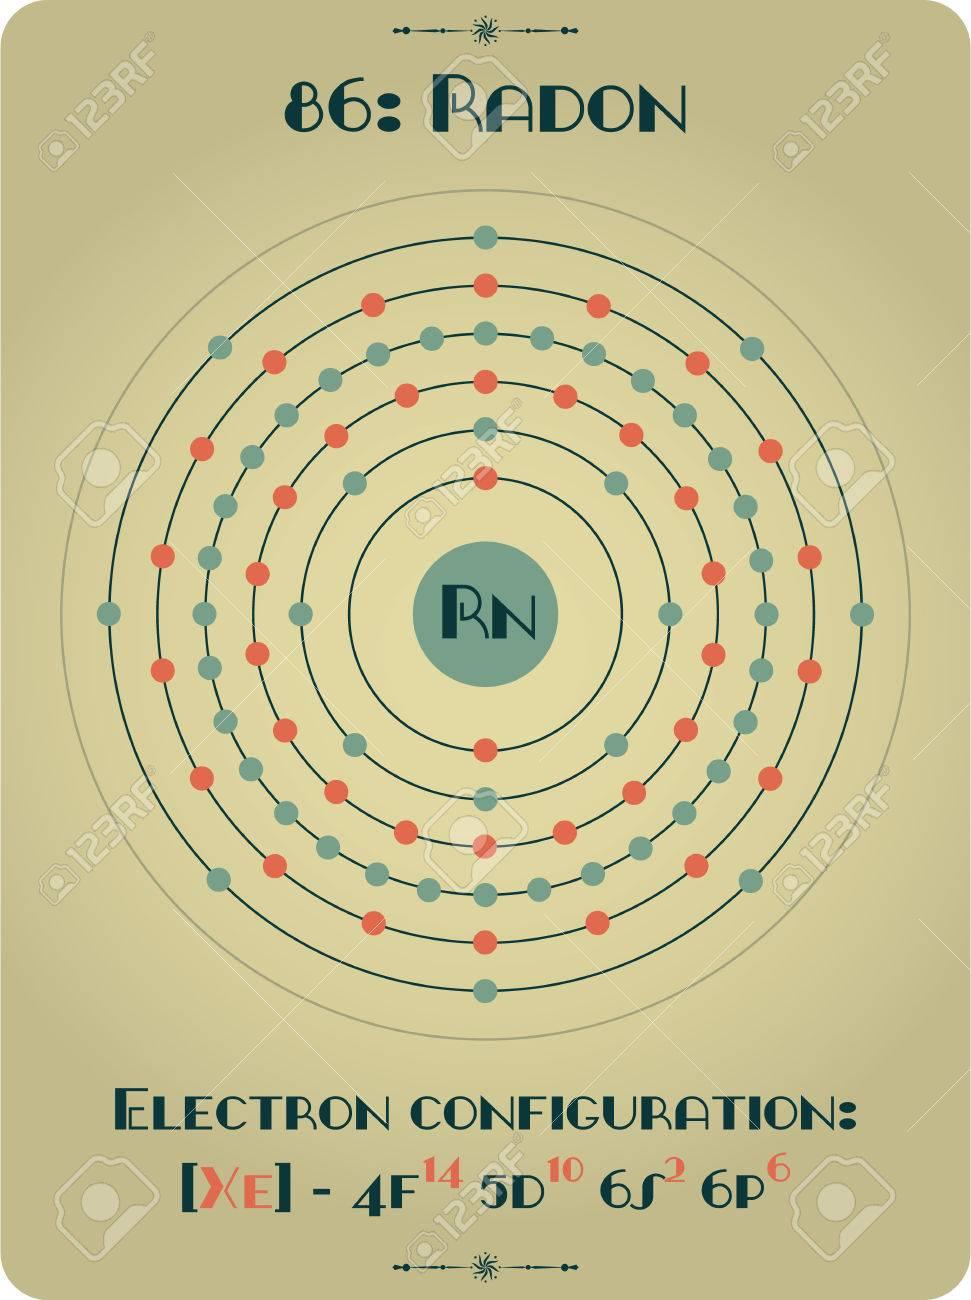 Radon Electron Configuration 66559 | GCONSULTING